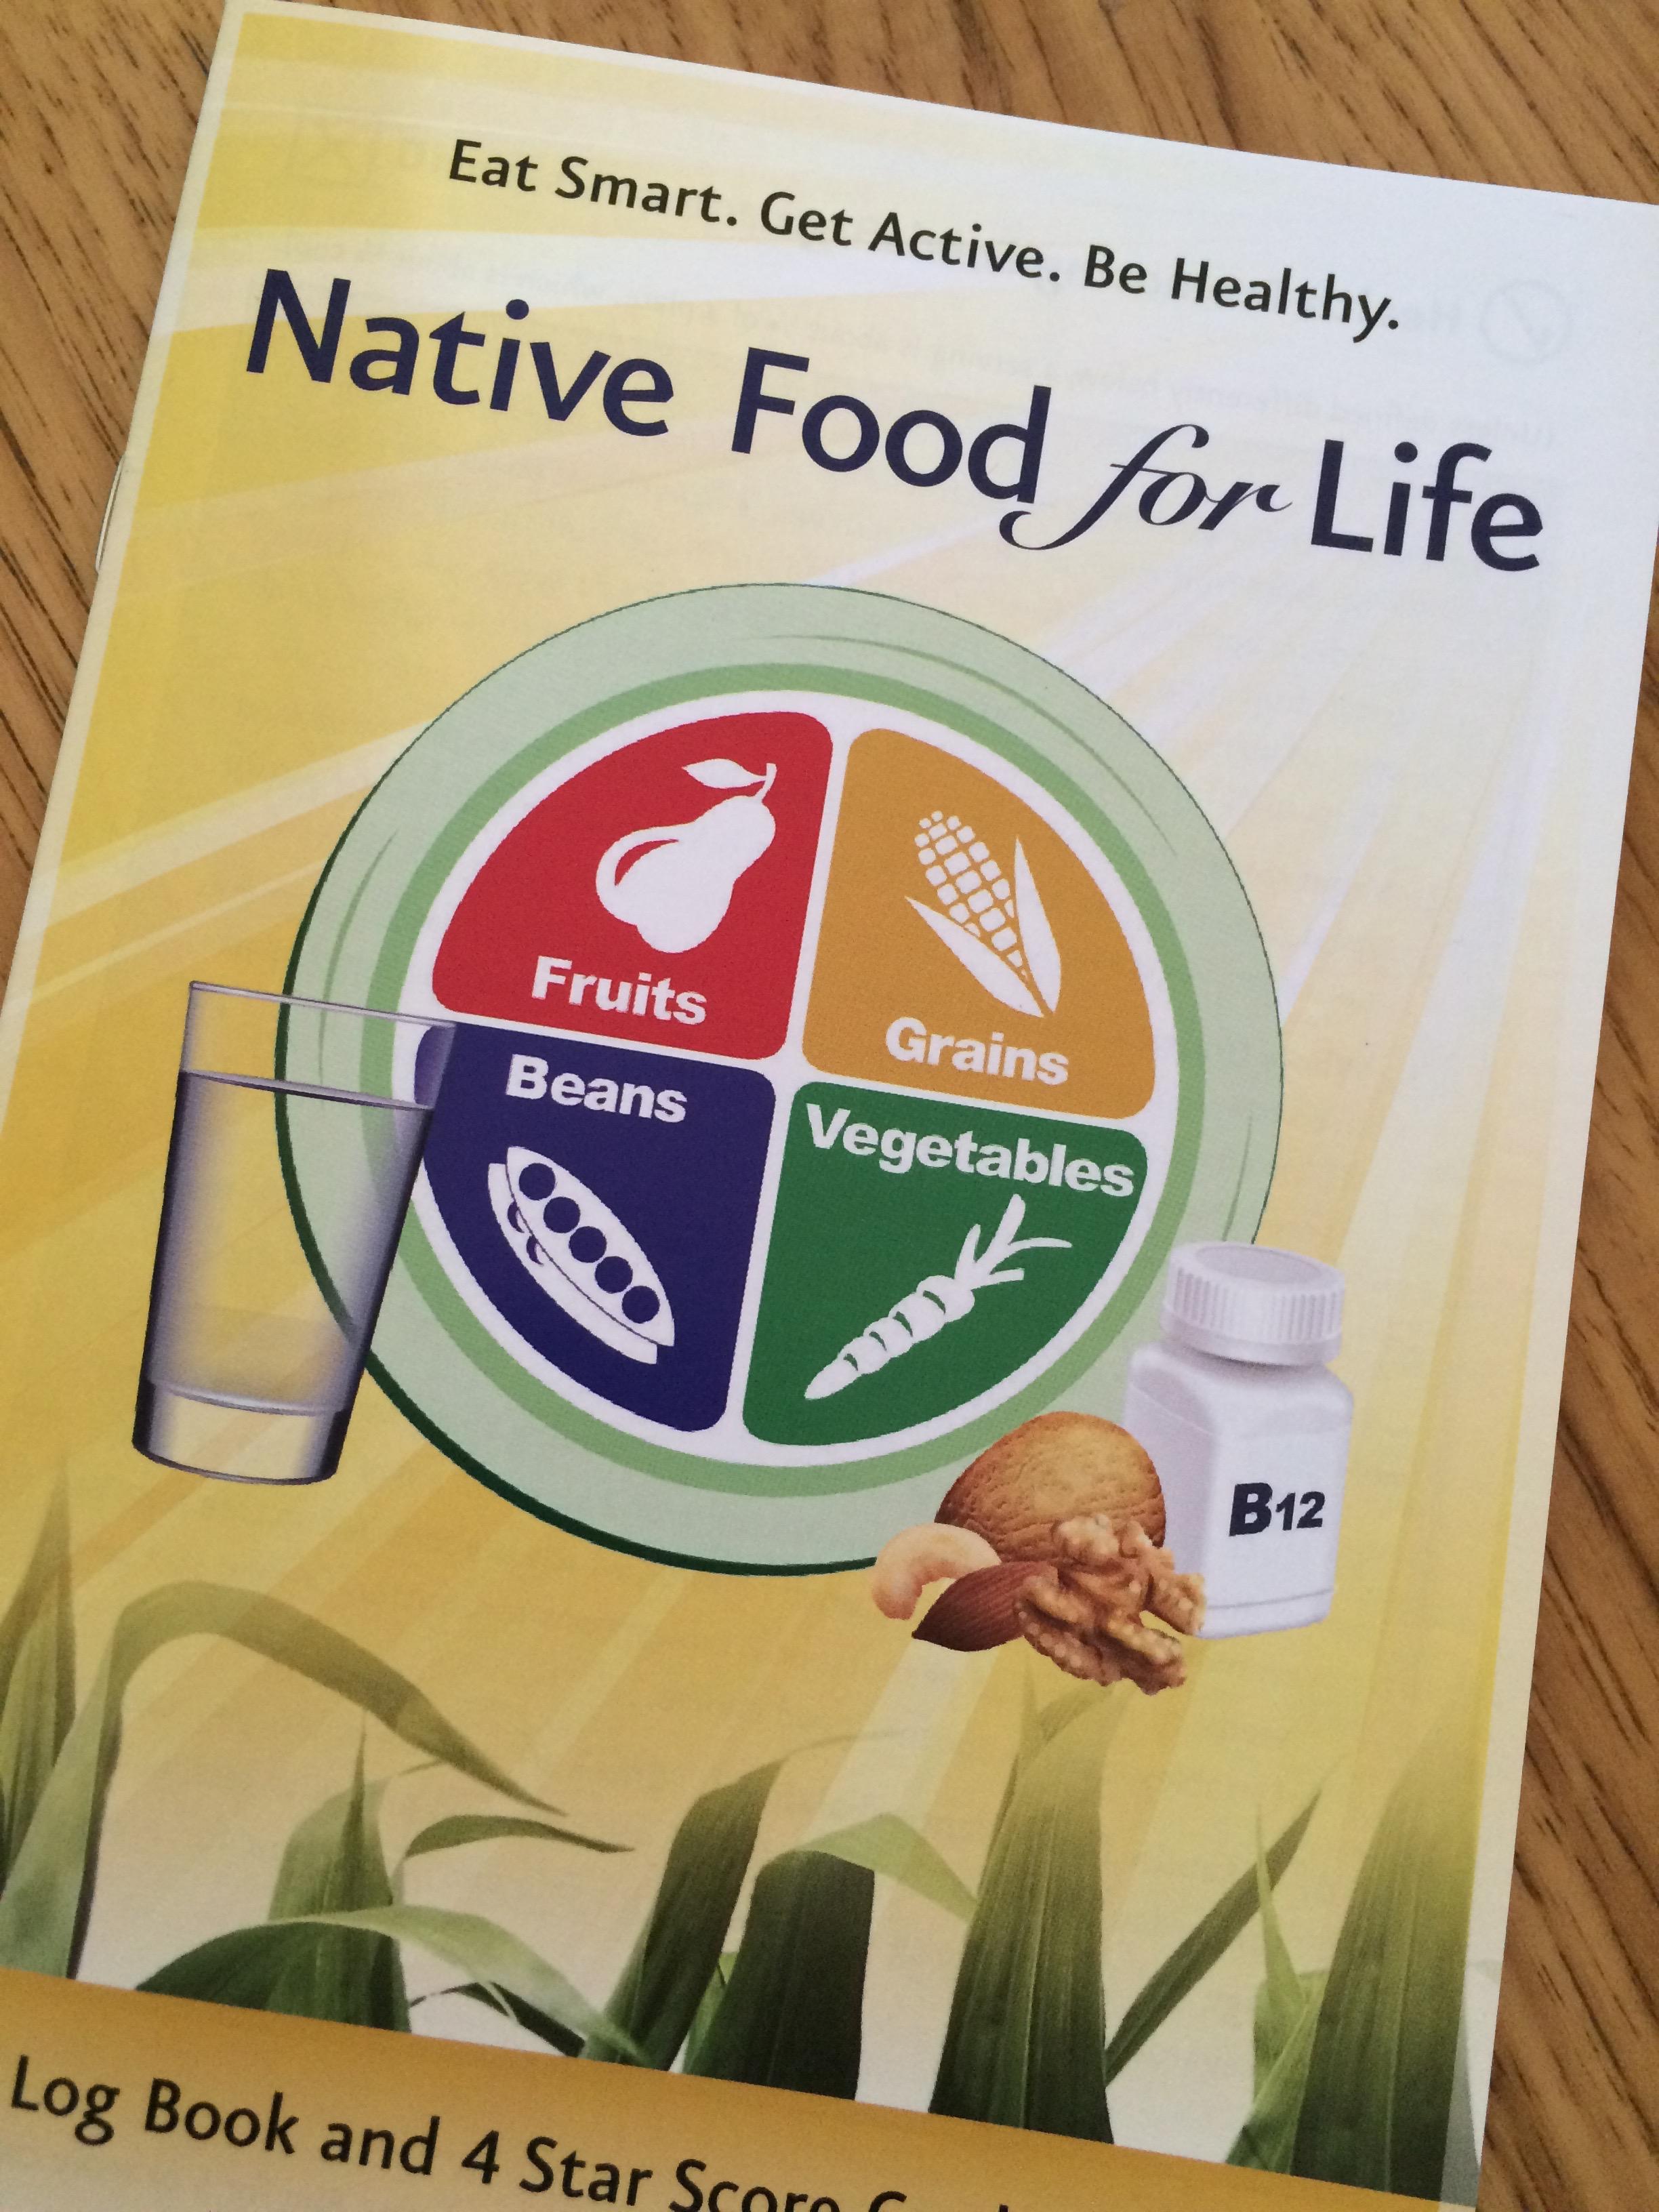 20161019_Native_Food001.jpg